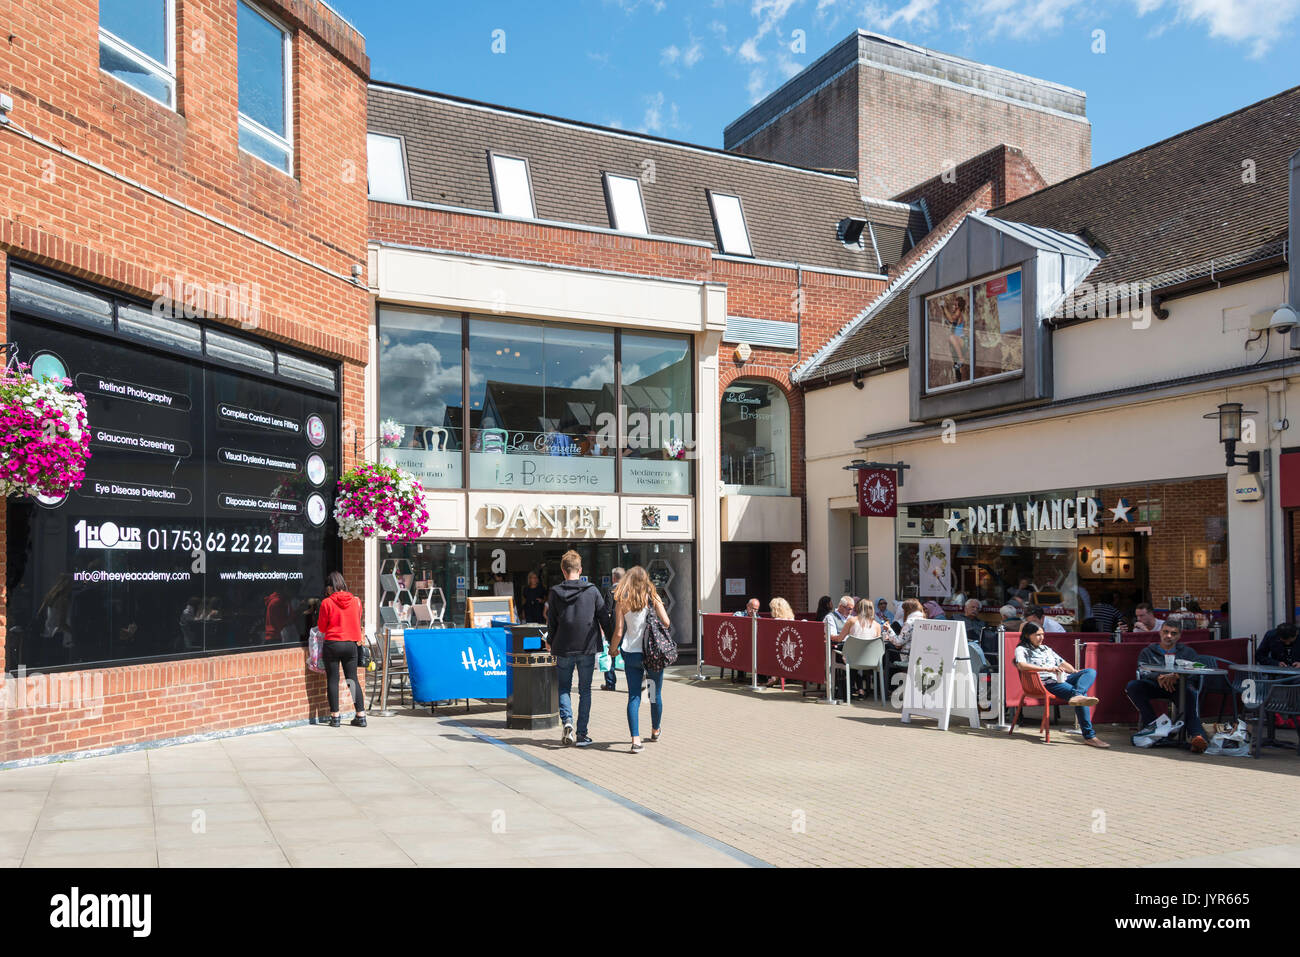 Entrance to Daniel Department Store, Bridgewater Way, Windsor, Berkshire, England, United Kingdom - Stock Image